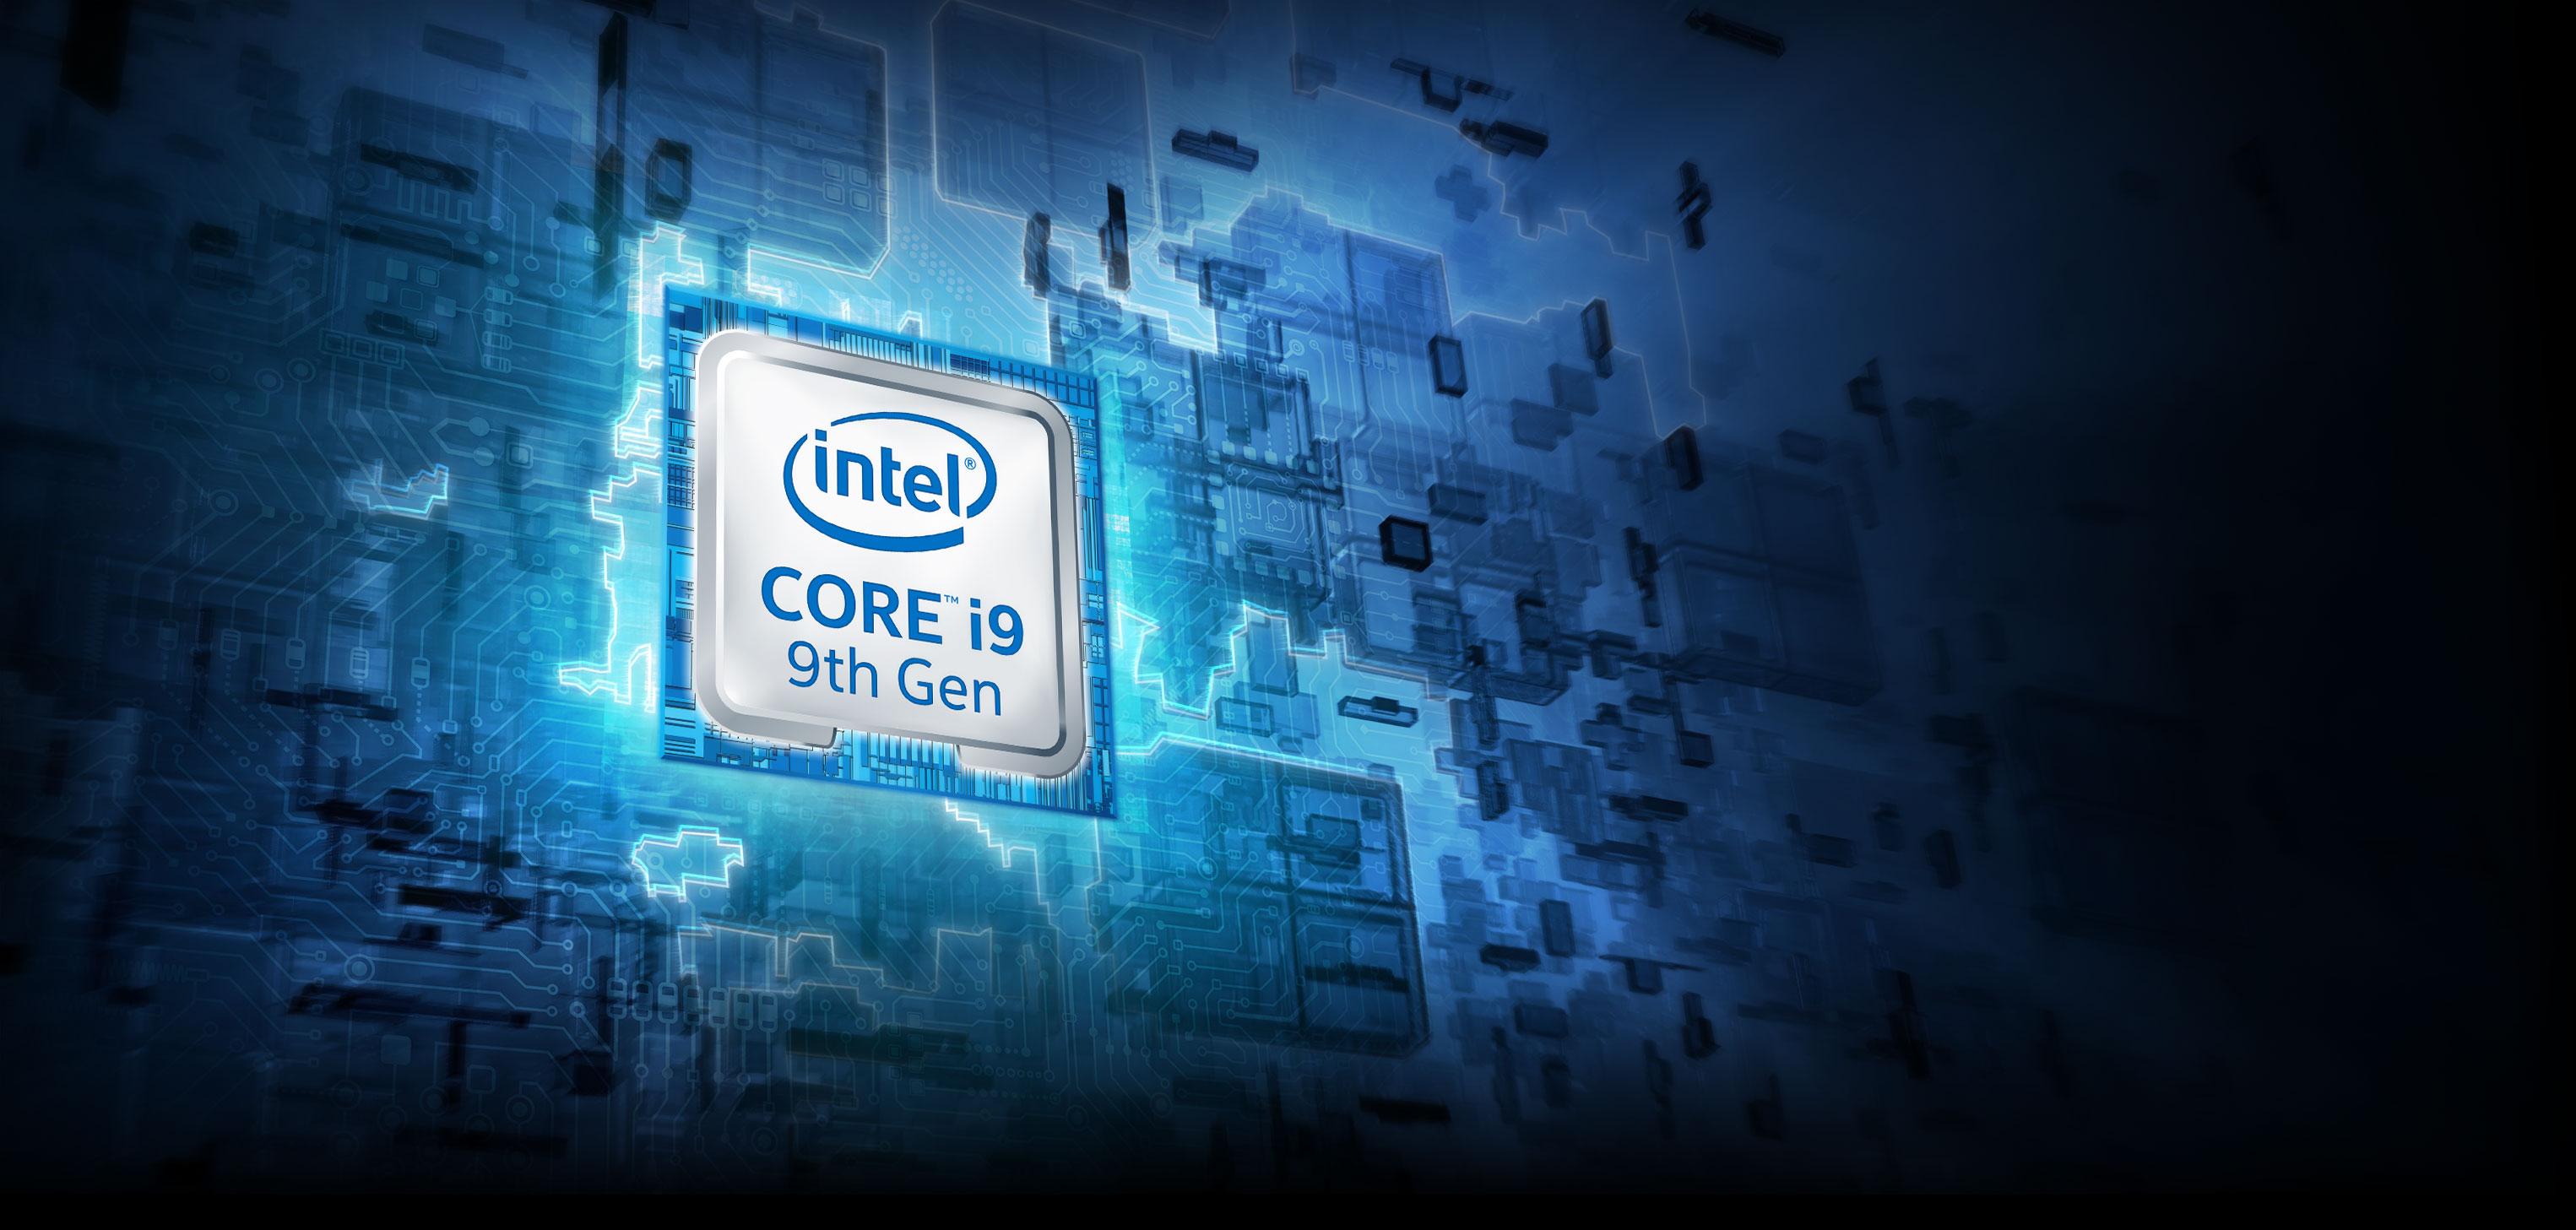 MSI GeForce RTX 20 & GTX 16 Series Gaming Laptop – The Game Just Got